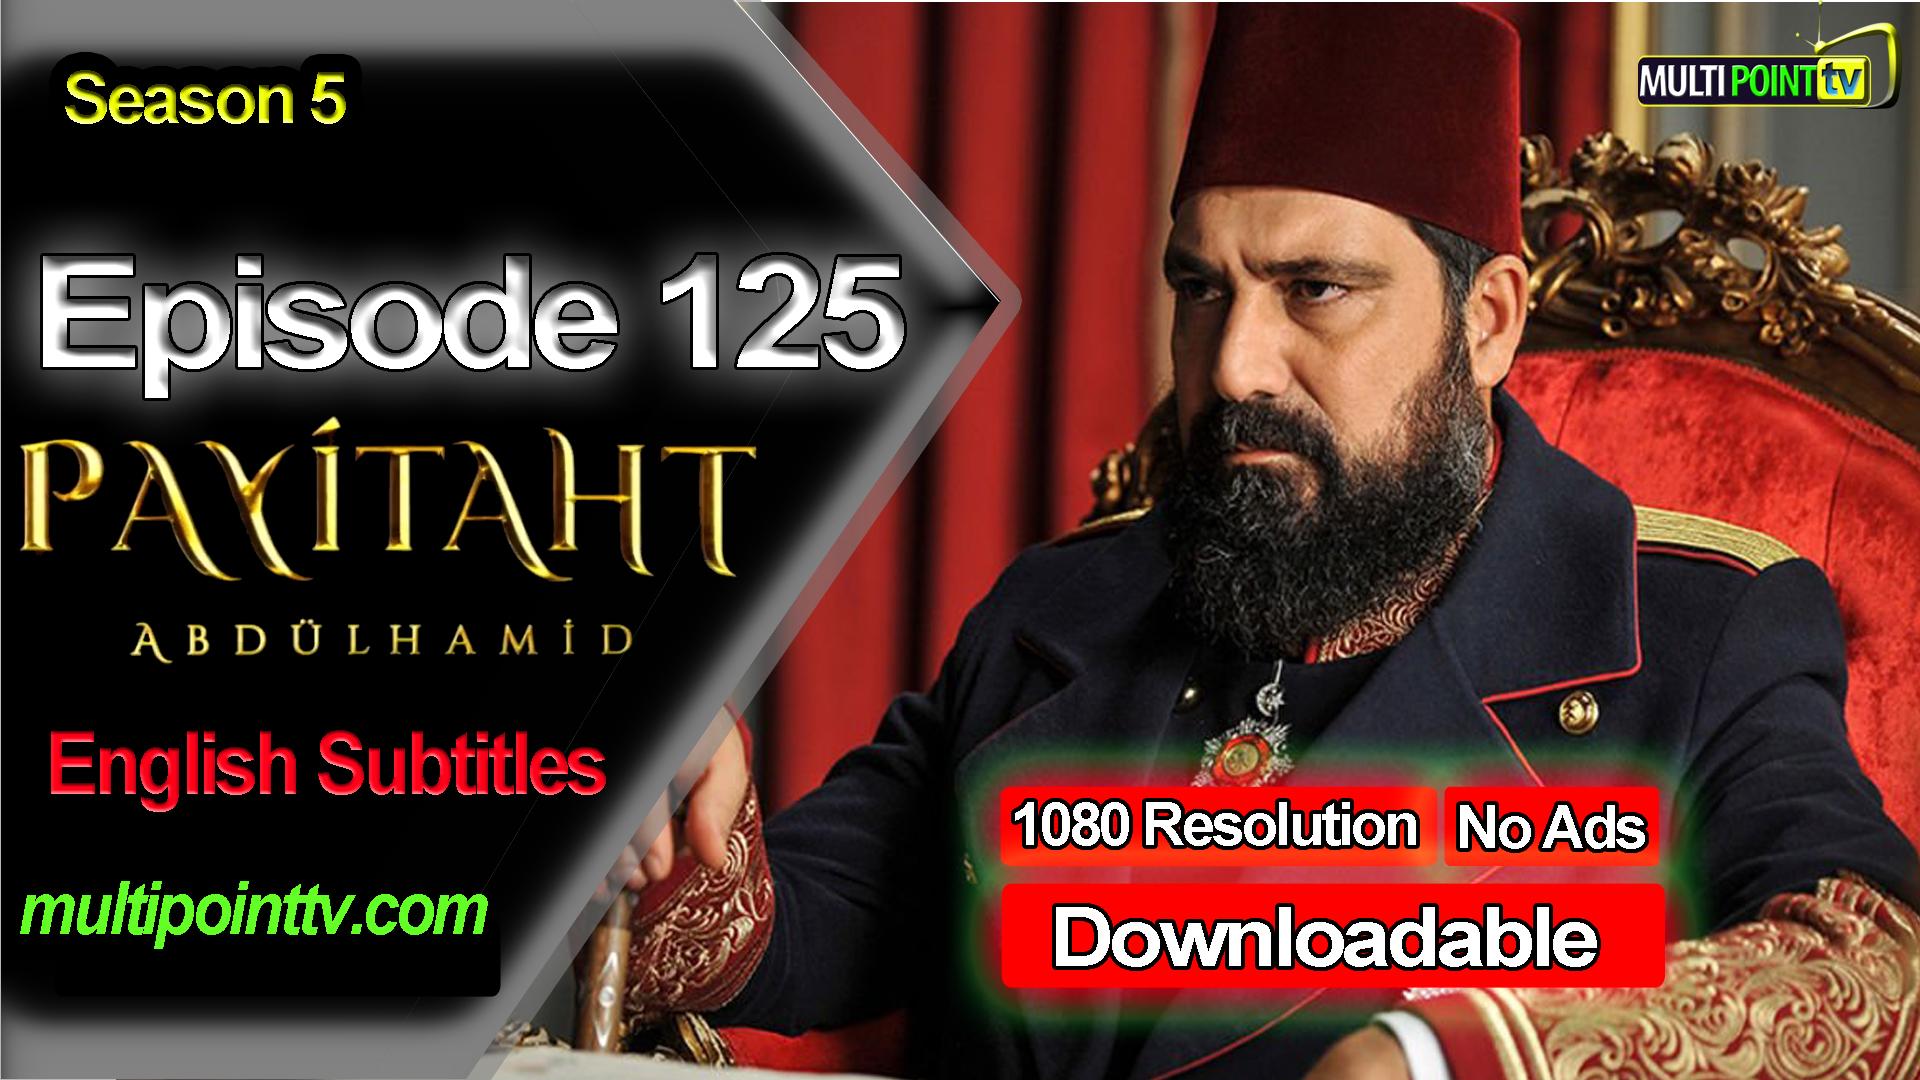 Payitaht Abdulhamid Episode 125 English Subtitles